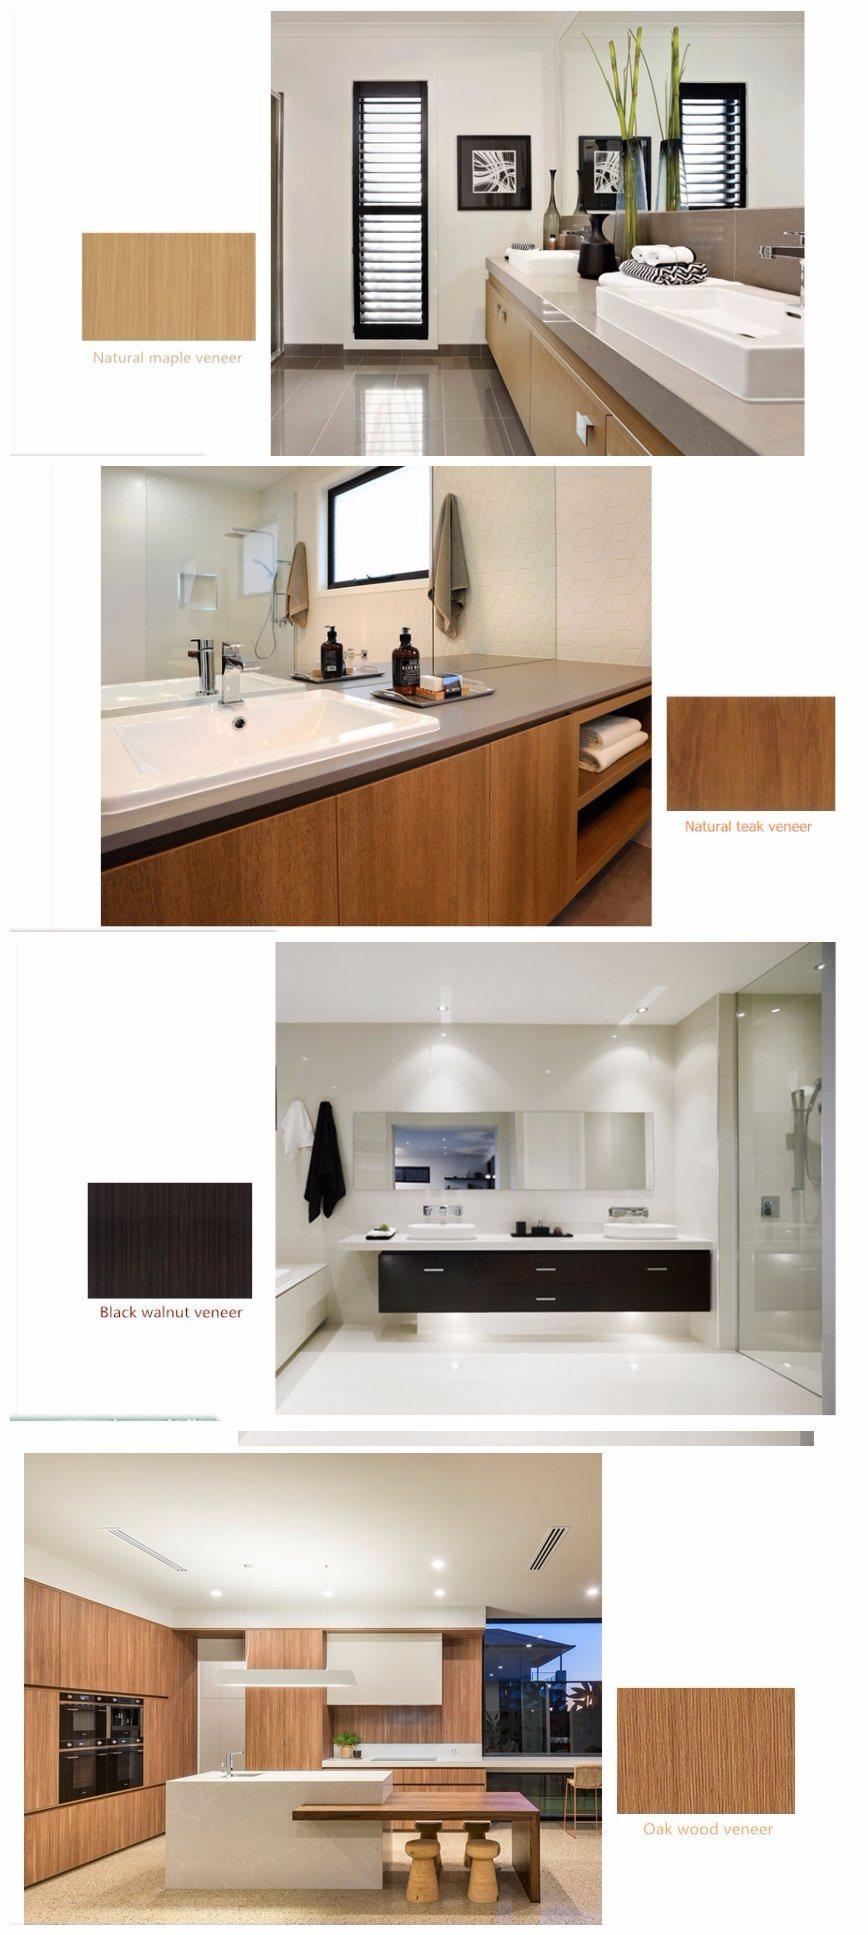 China Teak Wood Timber Veneer Kitchen Cabinets Home ...